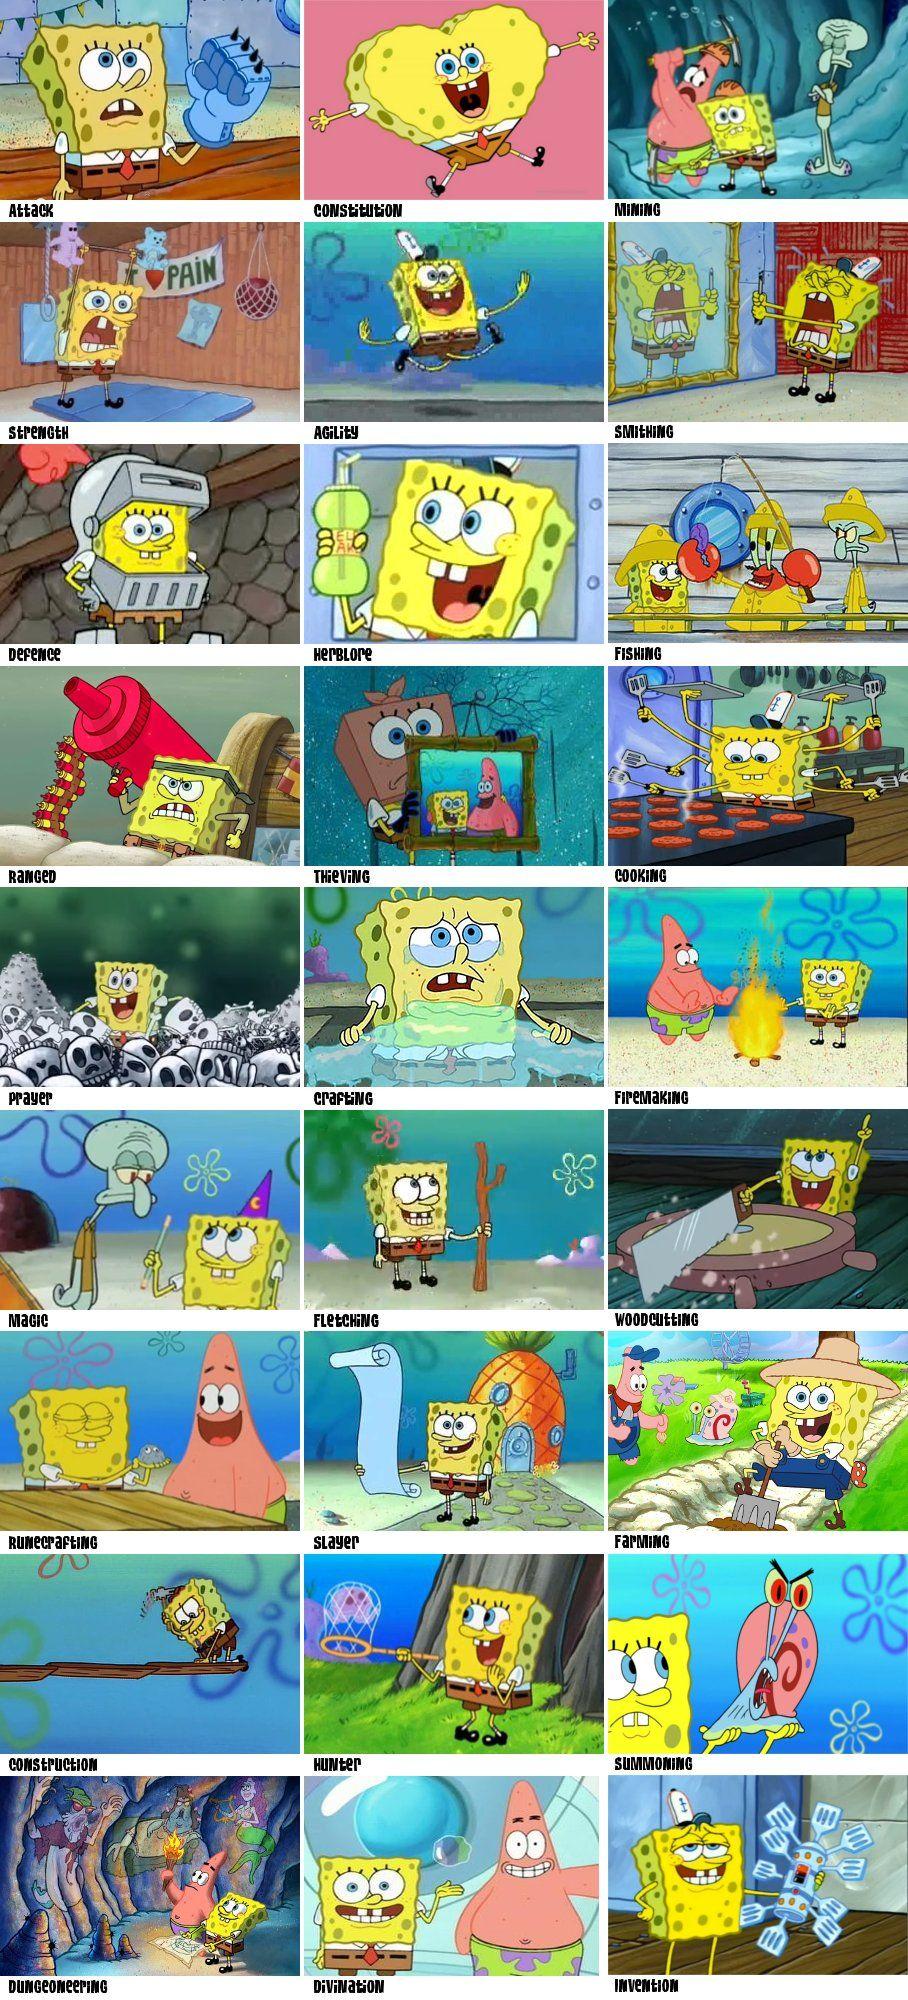 Spongebob training runescape skills